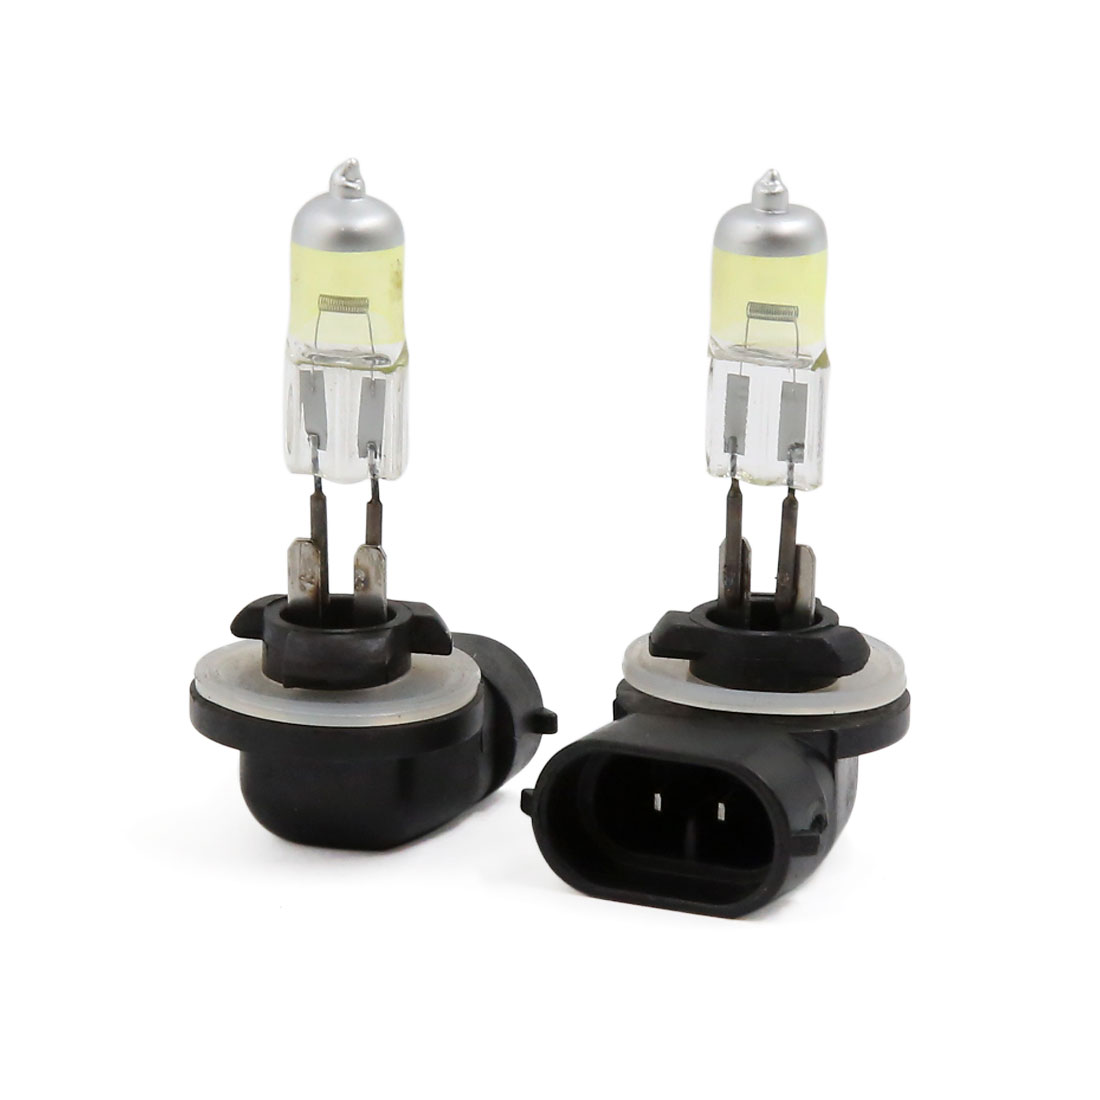 881 898 894 Golden Yellow Xenon Gas Halogen Fog Bulbs 12V 2pcs